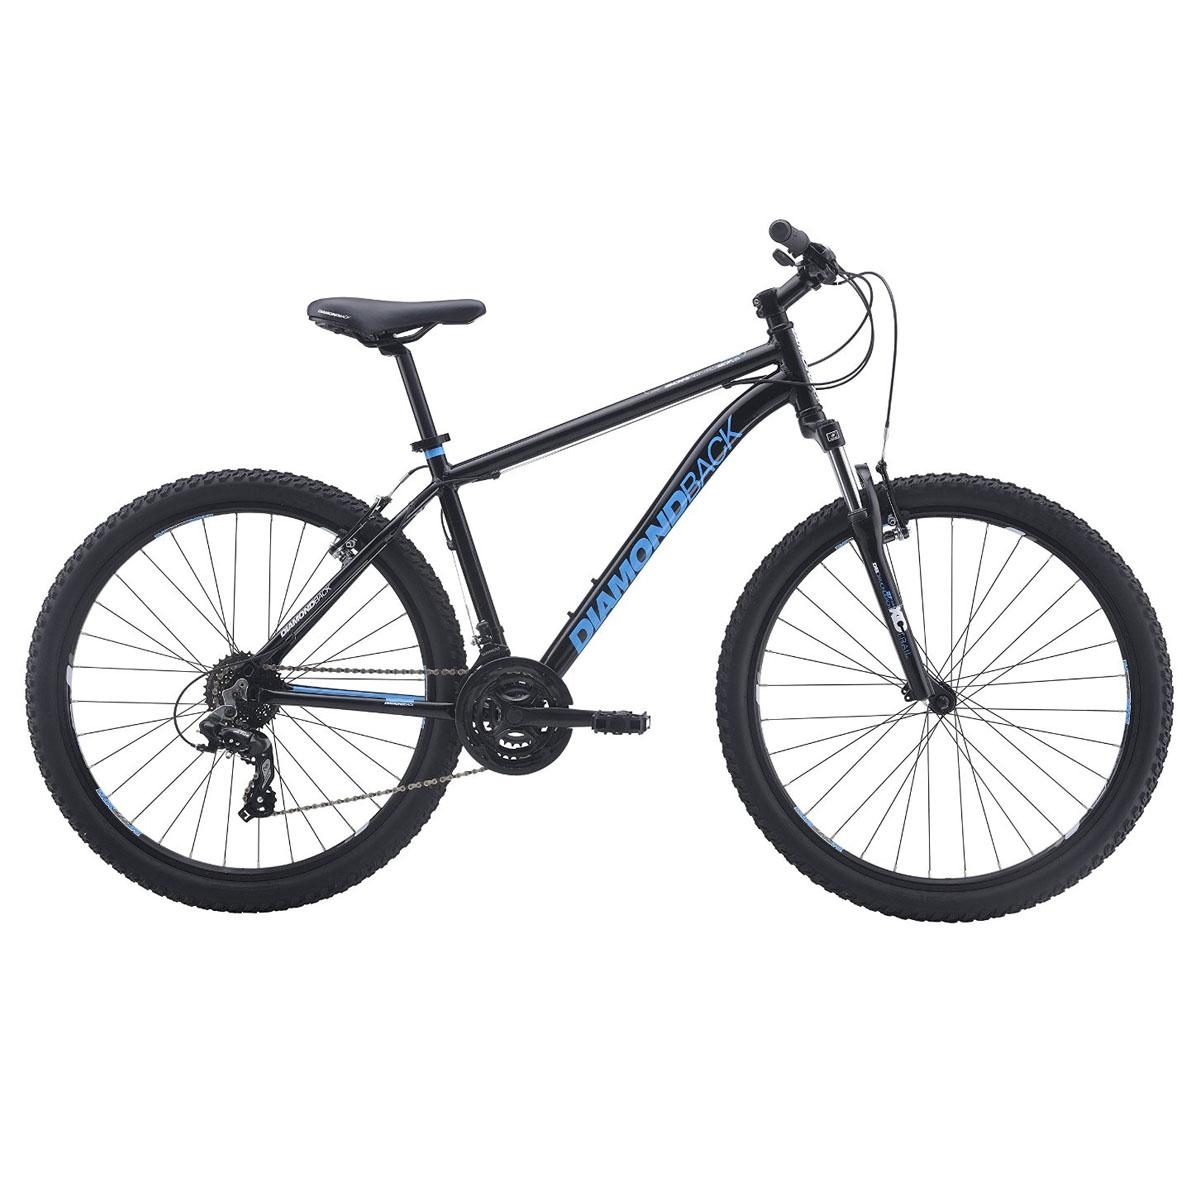 Diamondback Bicycles Sorrento Hard Tail Complete Mountain Bike Review